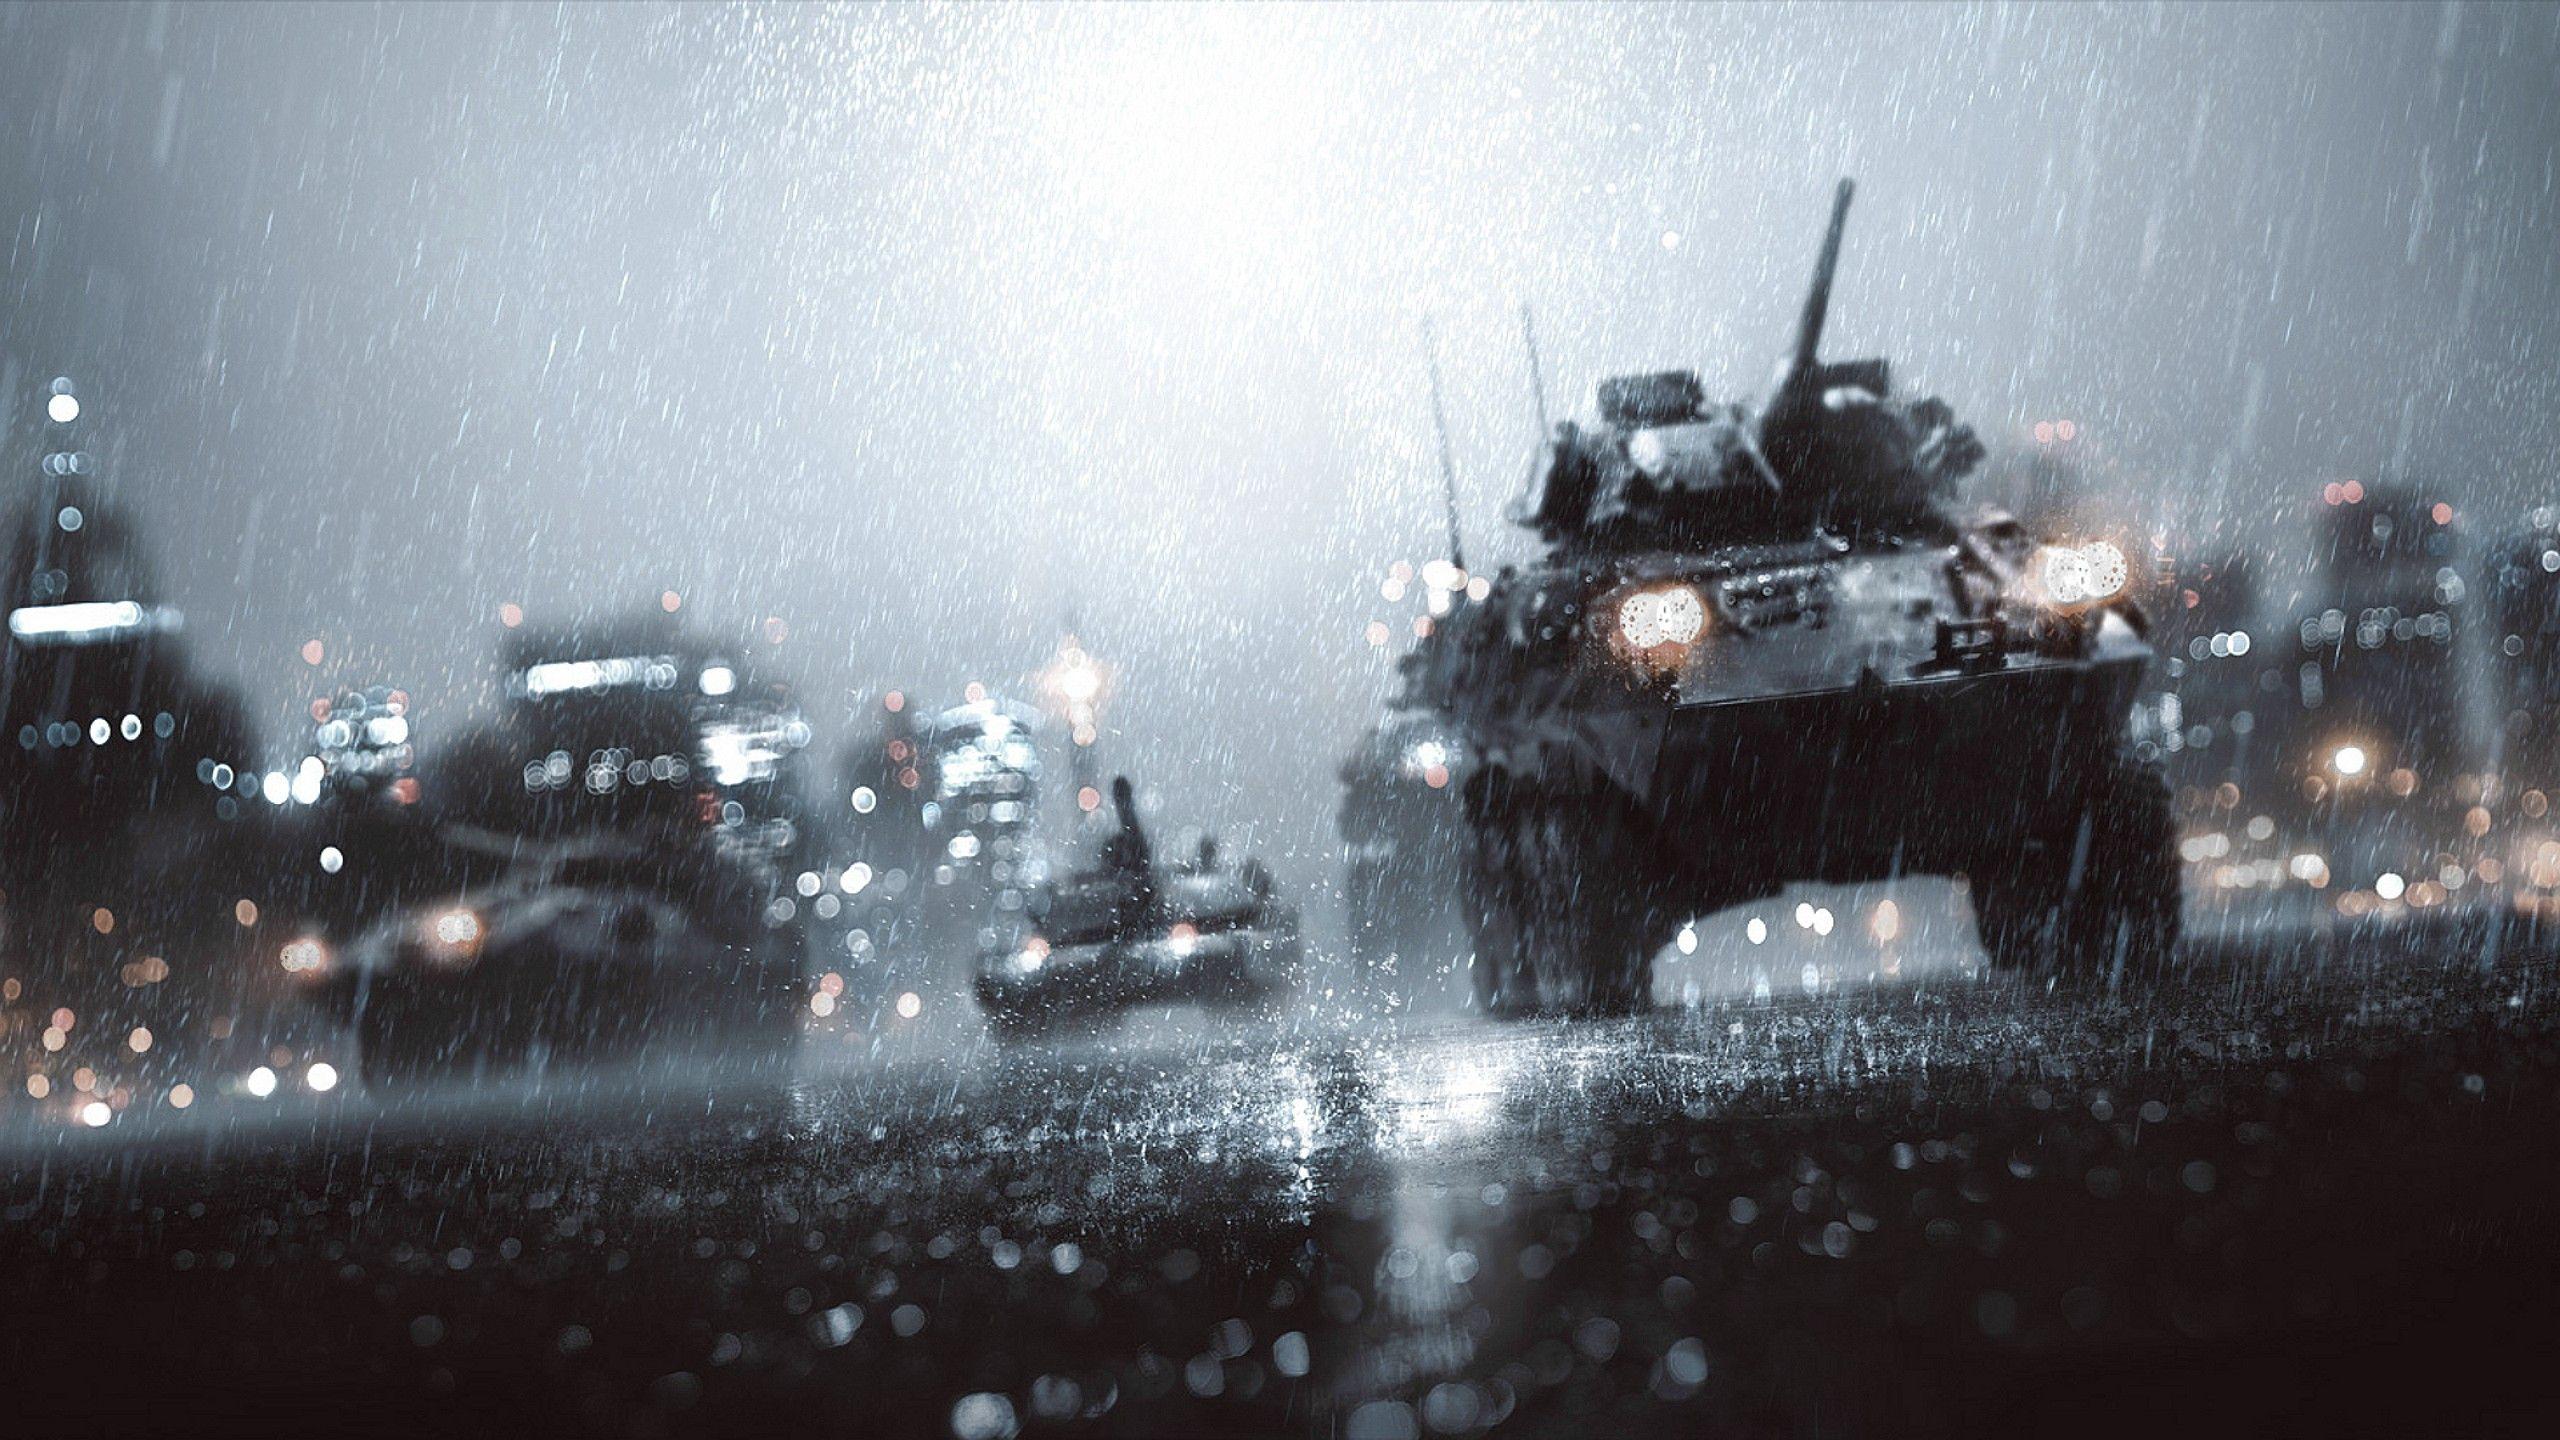 Battlefield Dice Ea Games 4 Wallpaper Natalia Poklonskaya Best Funny Pictures Battlefield